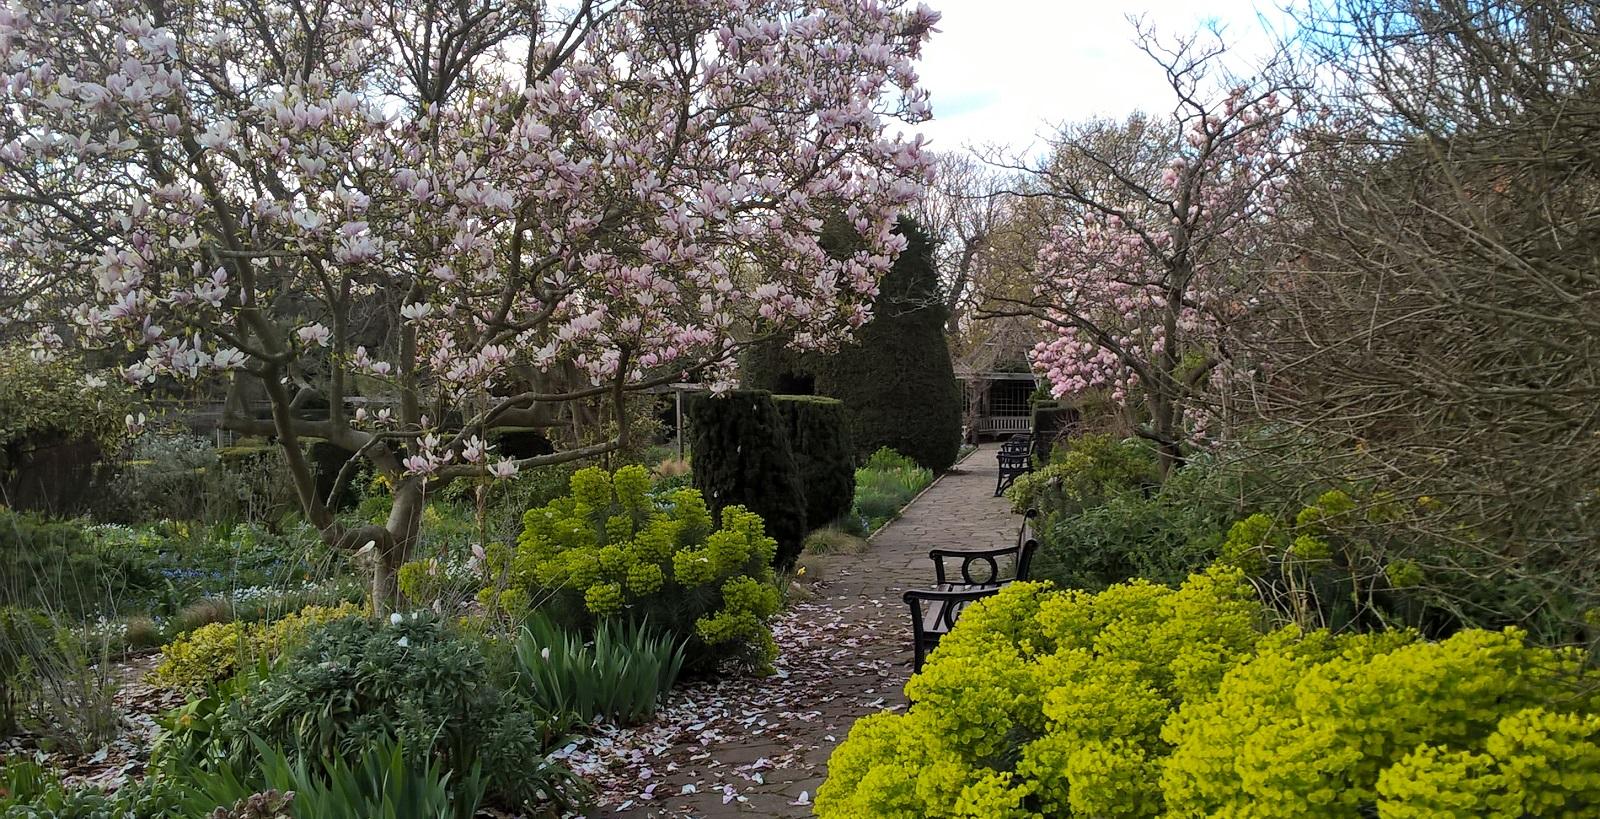 Brockwell Walled garden